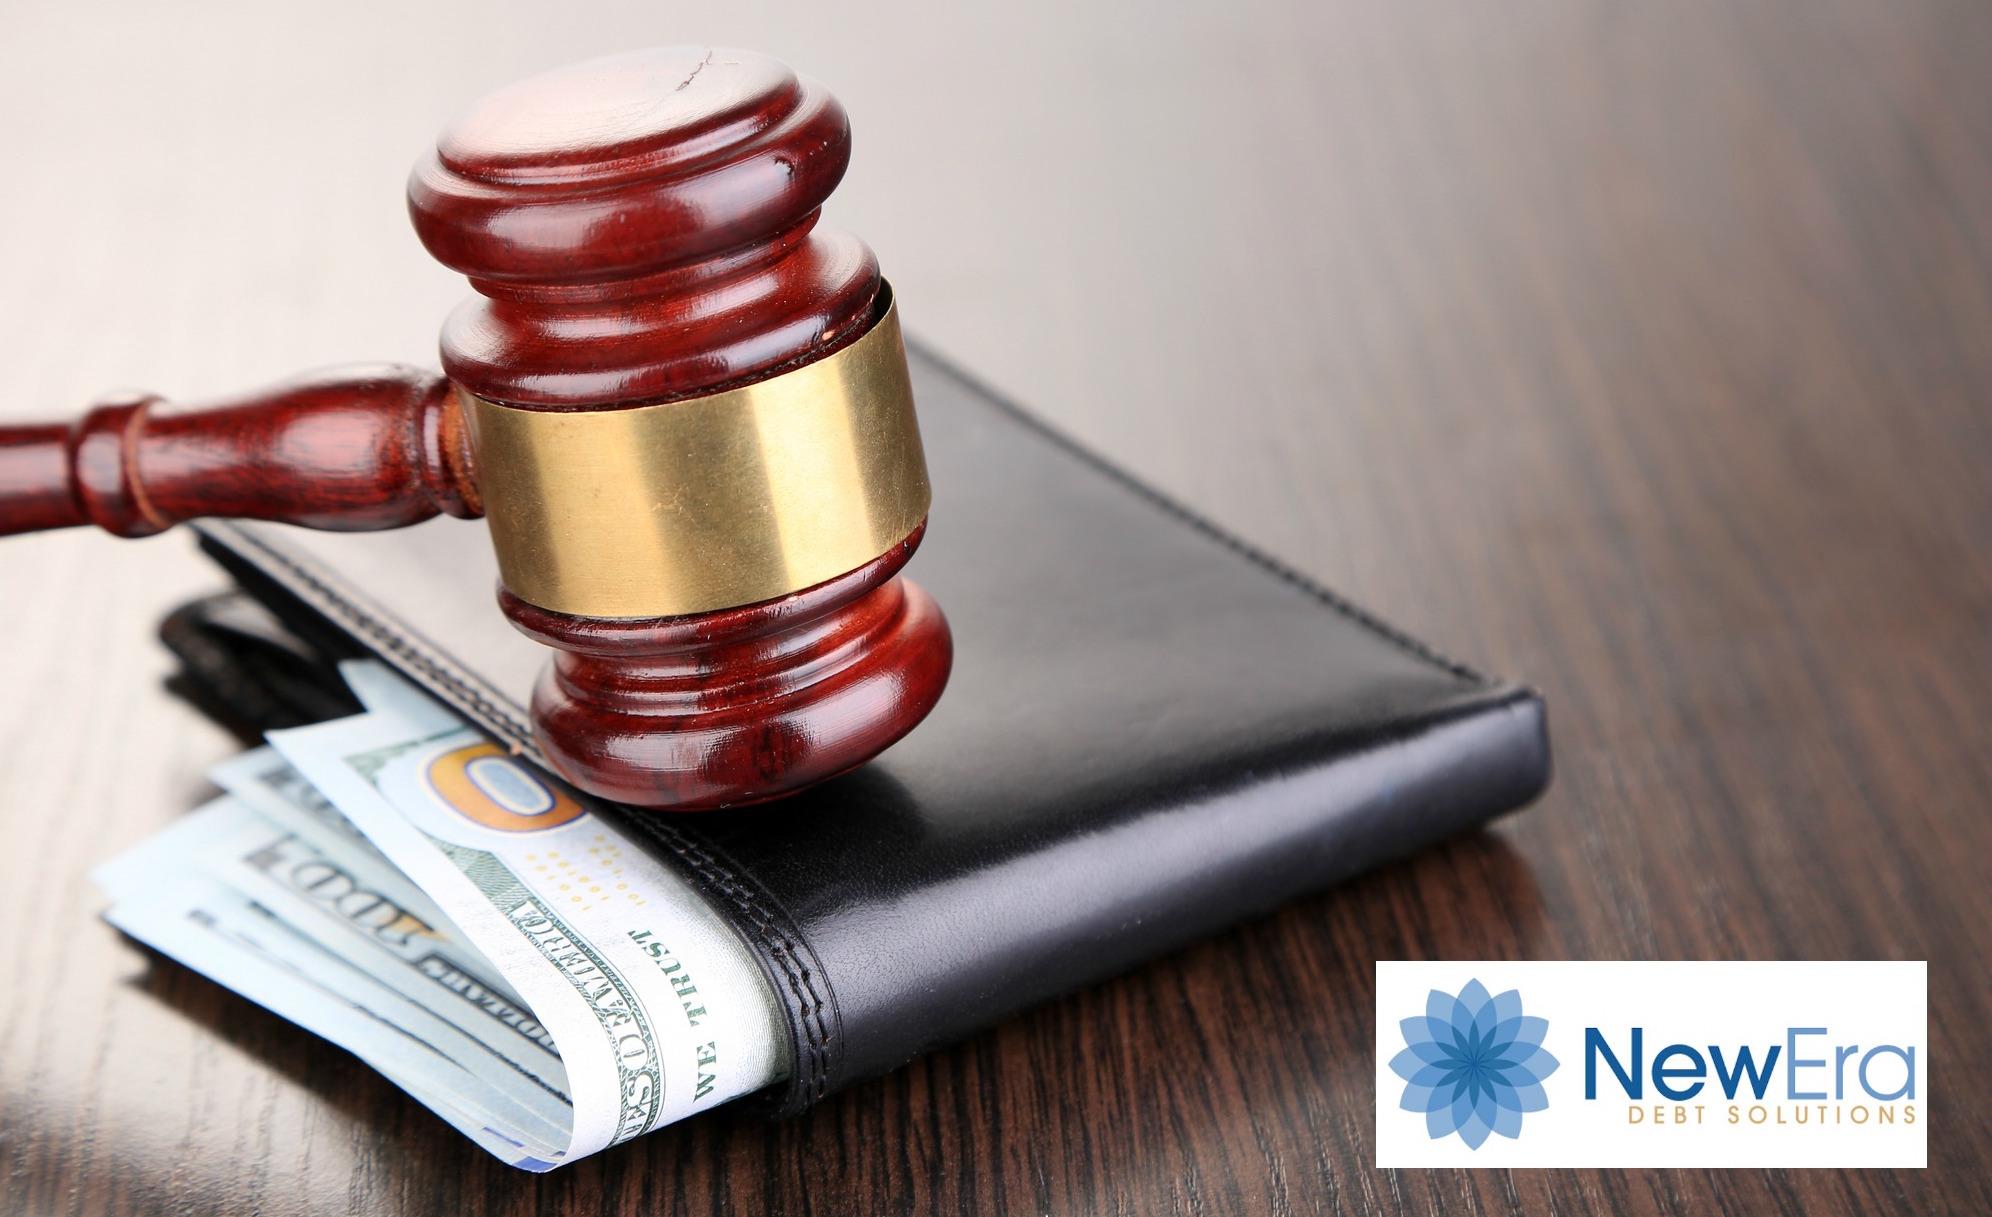 example company seeking funds using debt